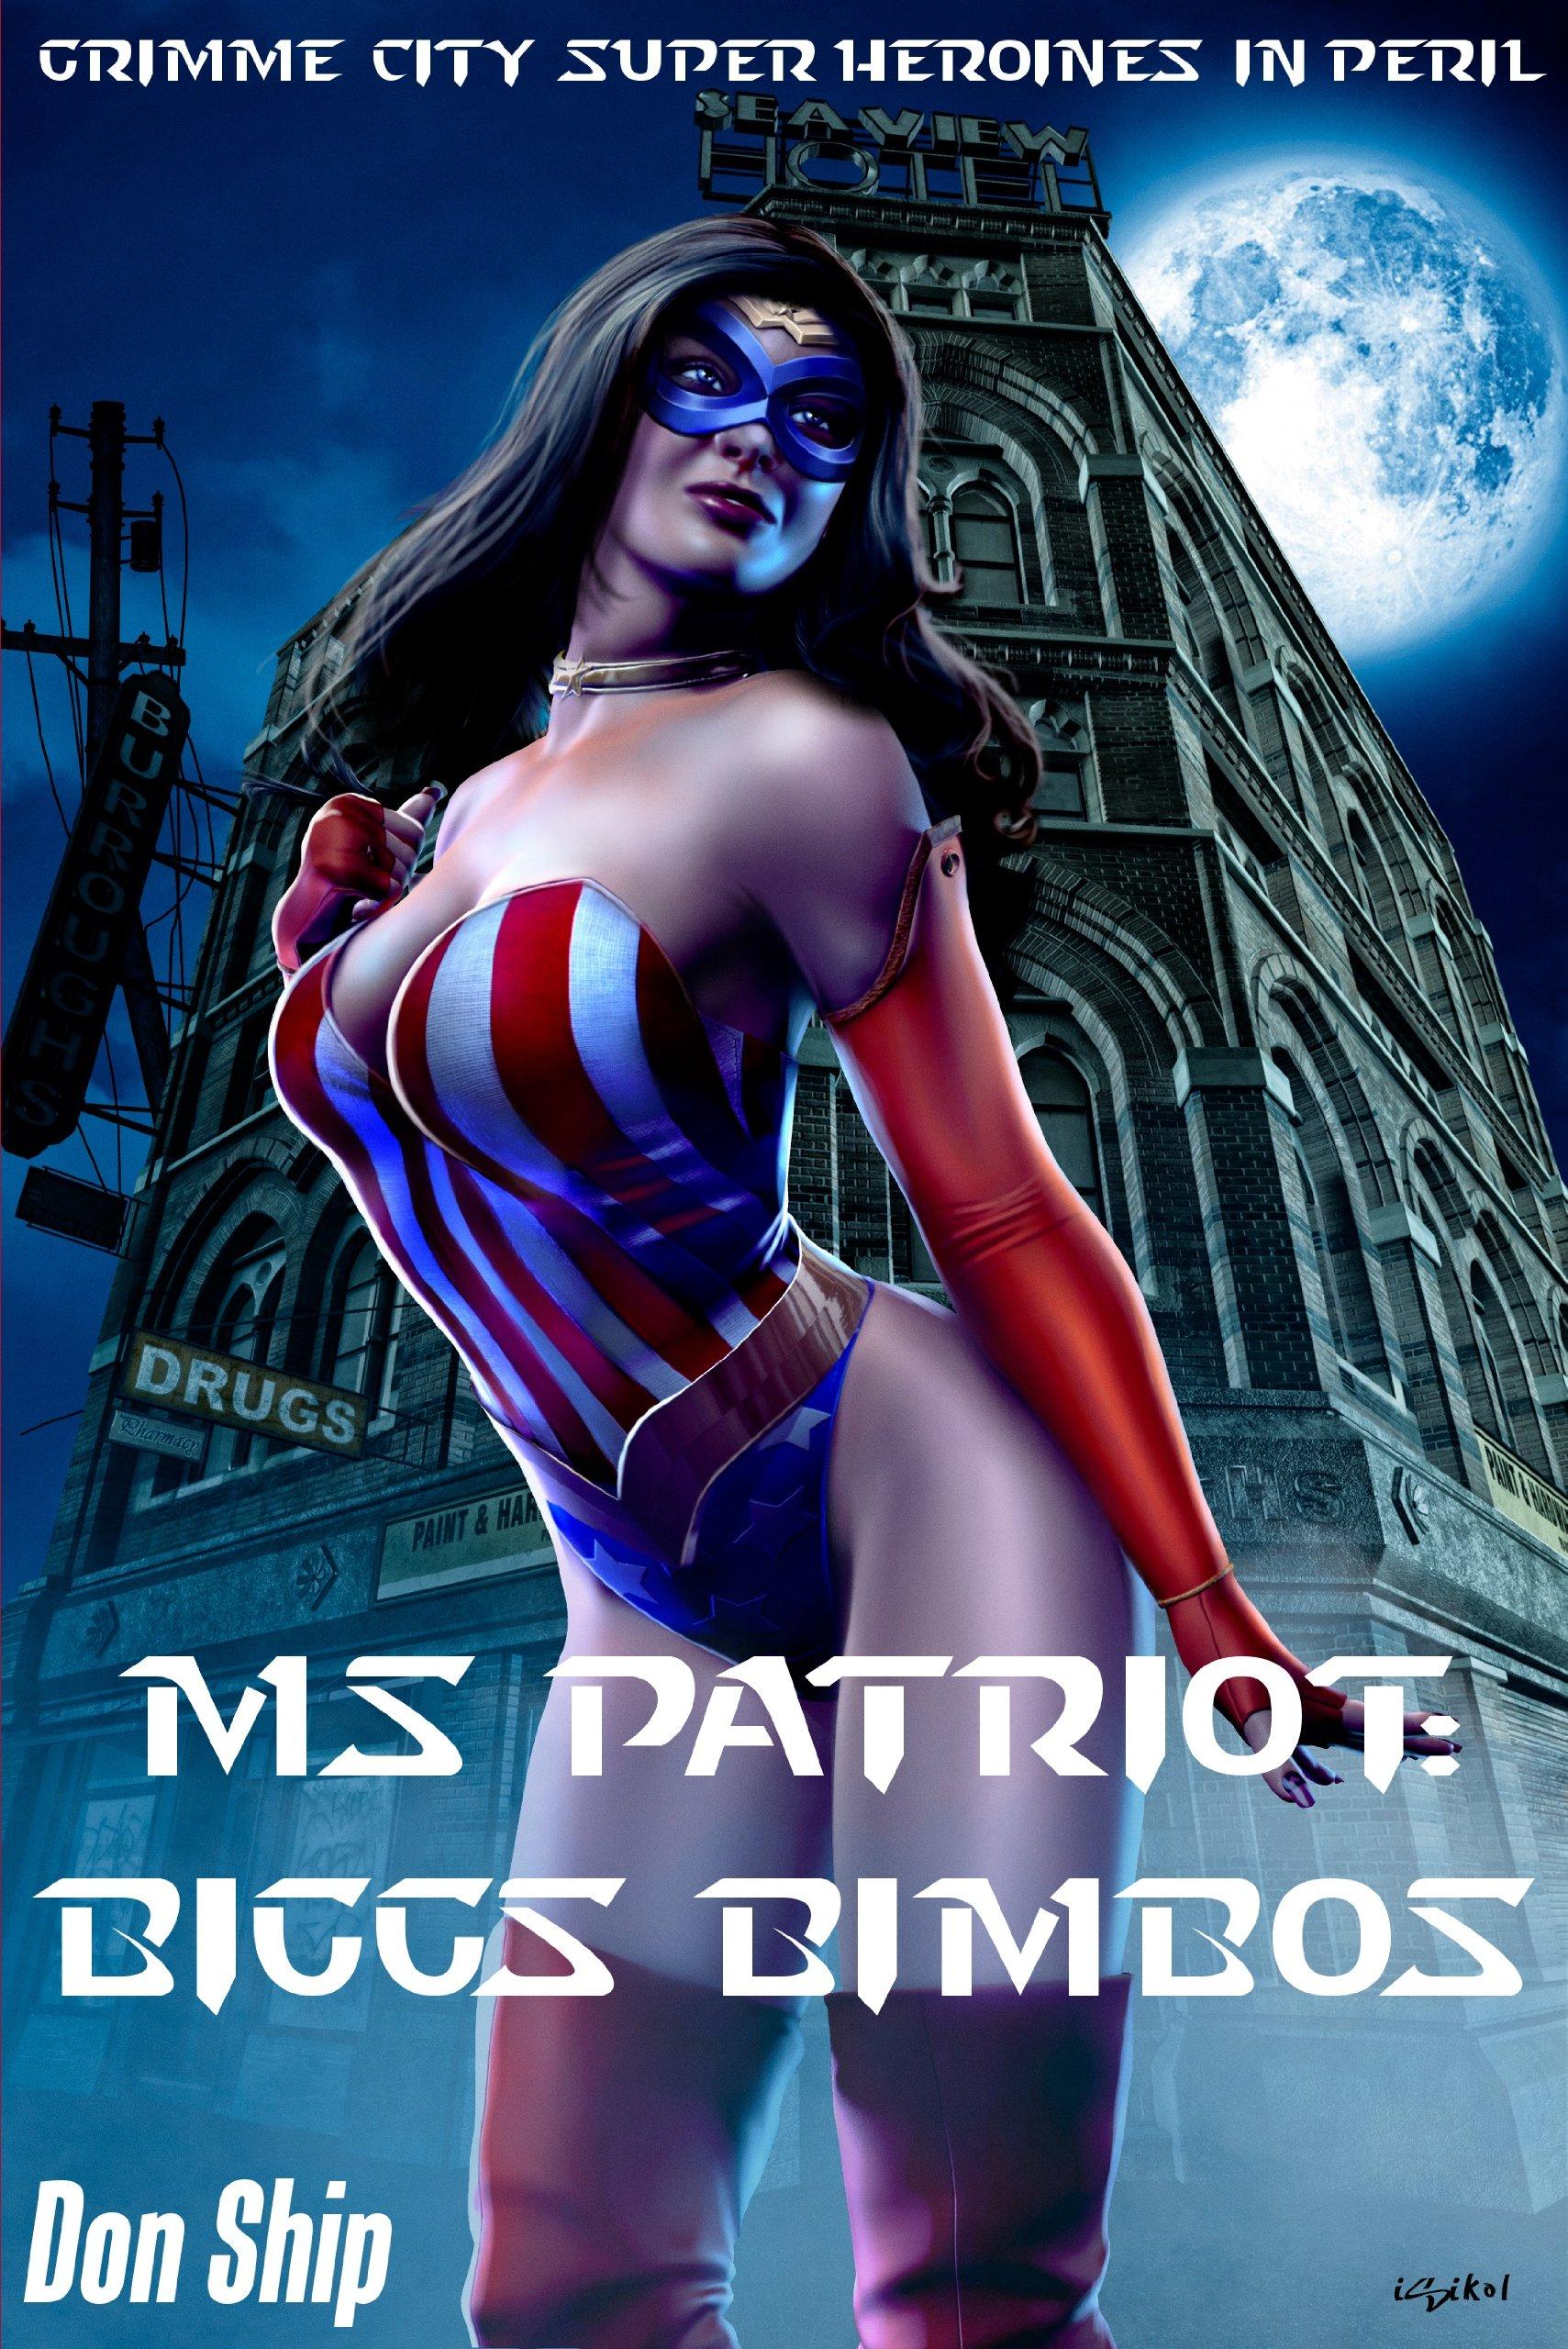 Peril superheroine in 🧡 Superheroine